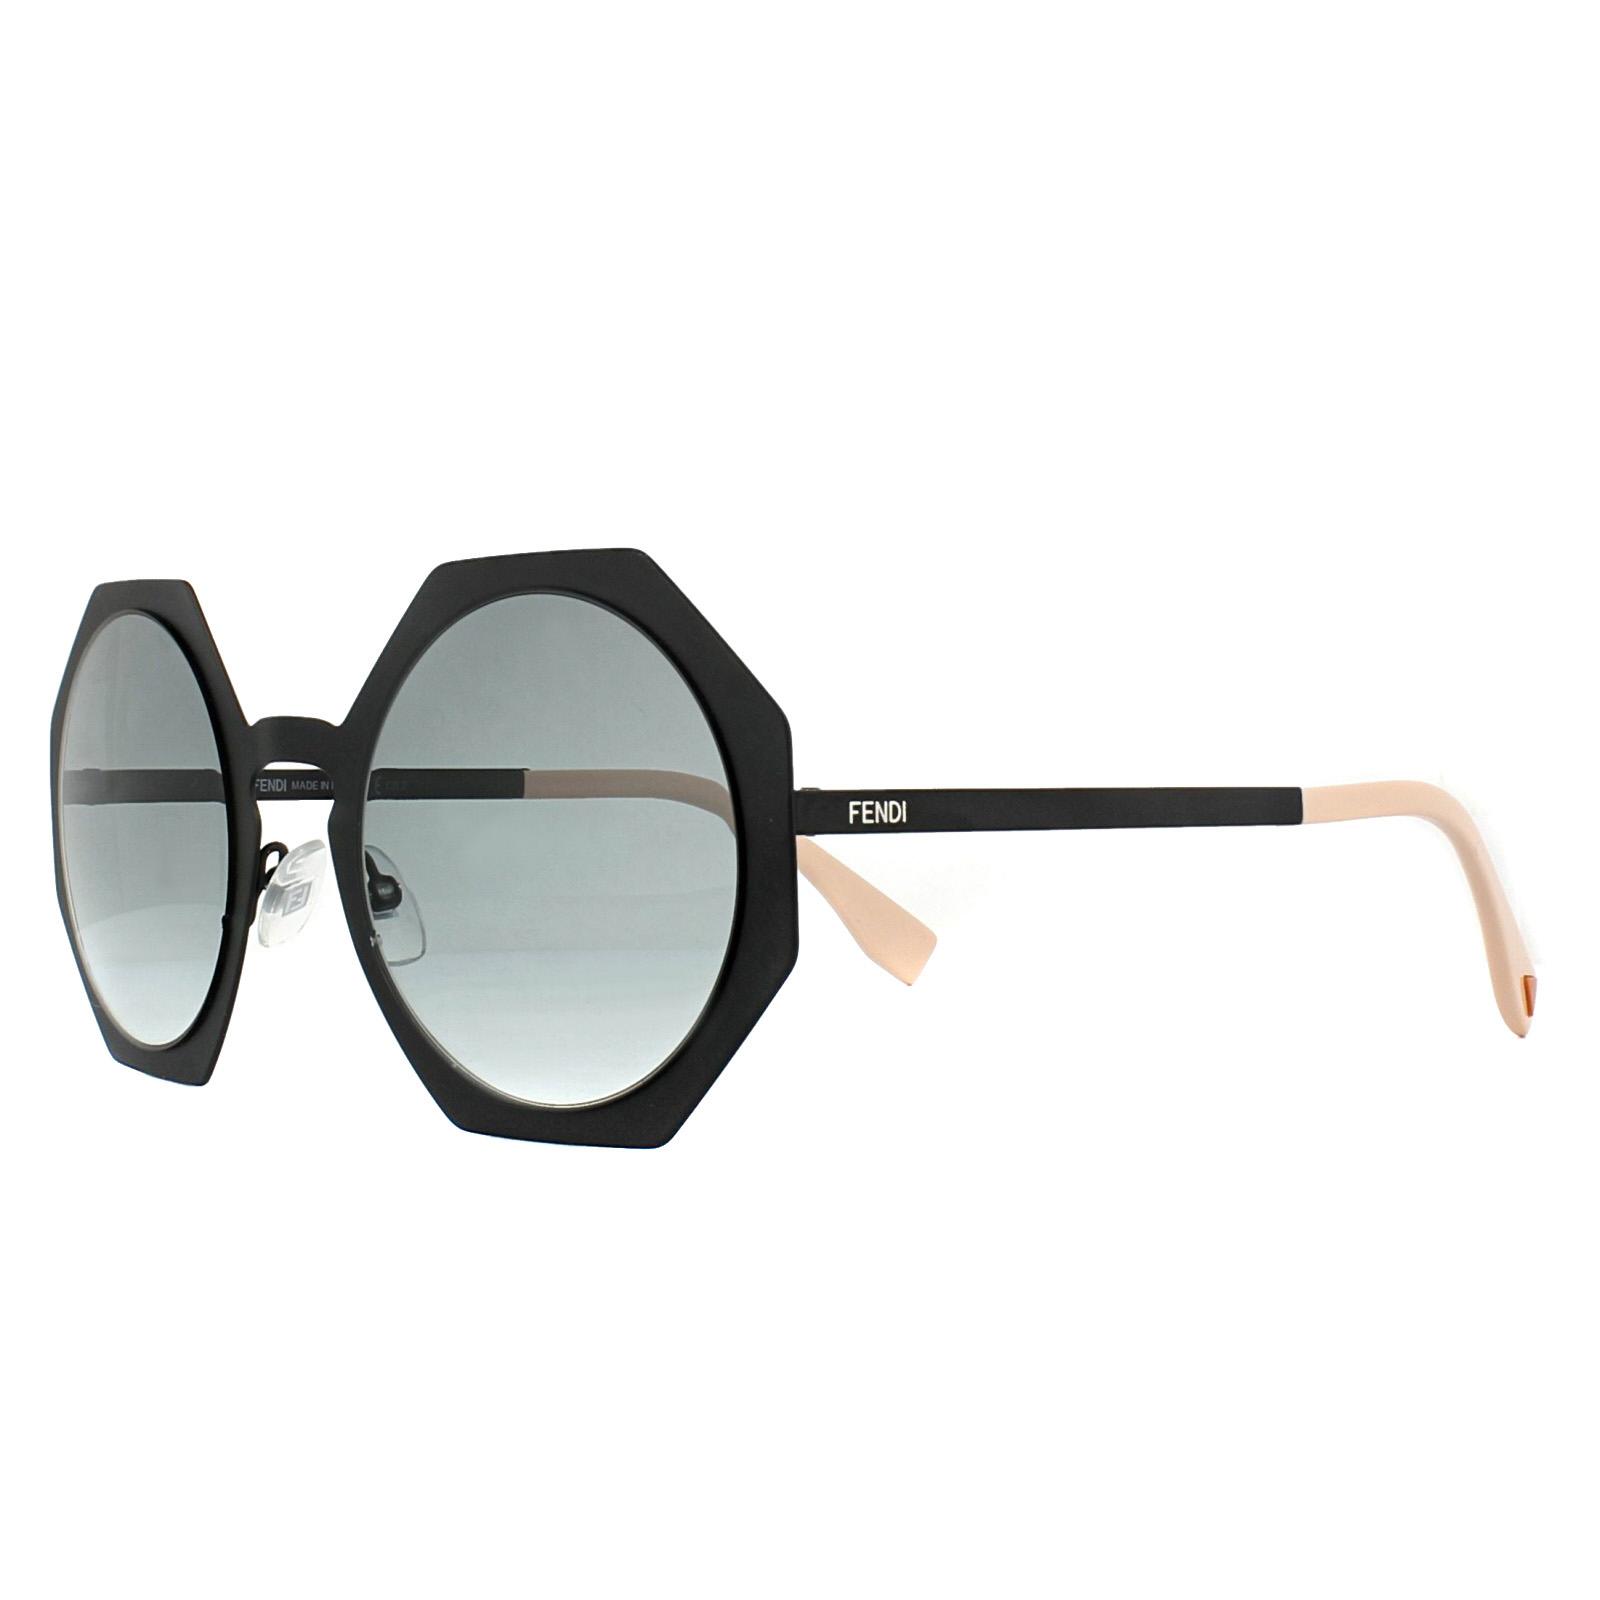 14ecf47e8a Sentinel Fendi Sunglasses Facets FF 0152 S 003 JJ Matt Black Grey Gradient